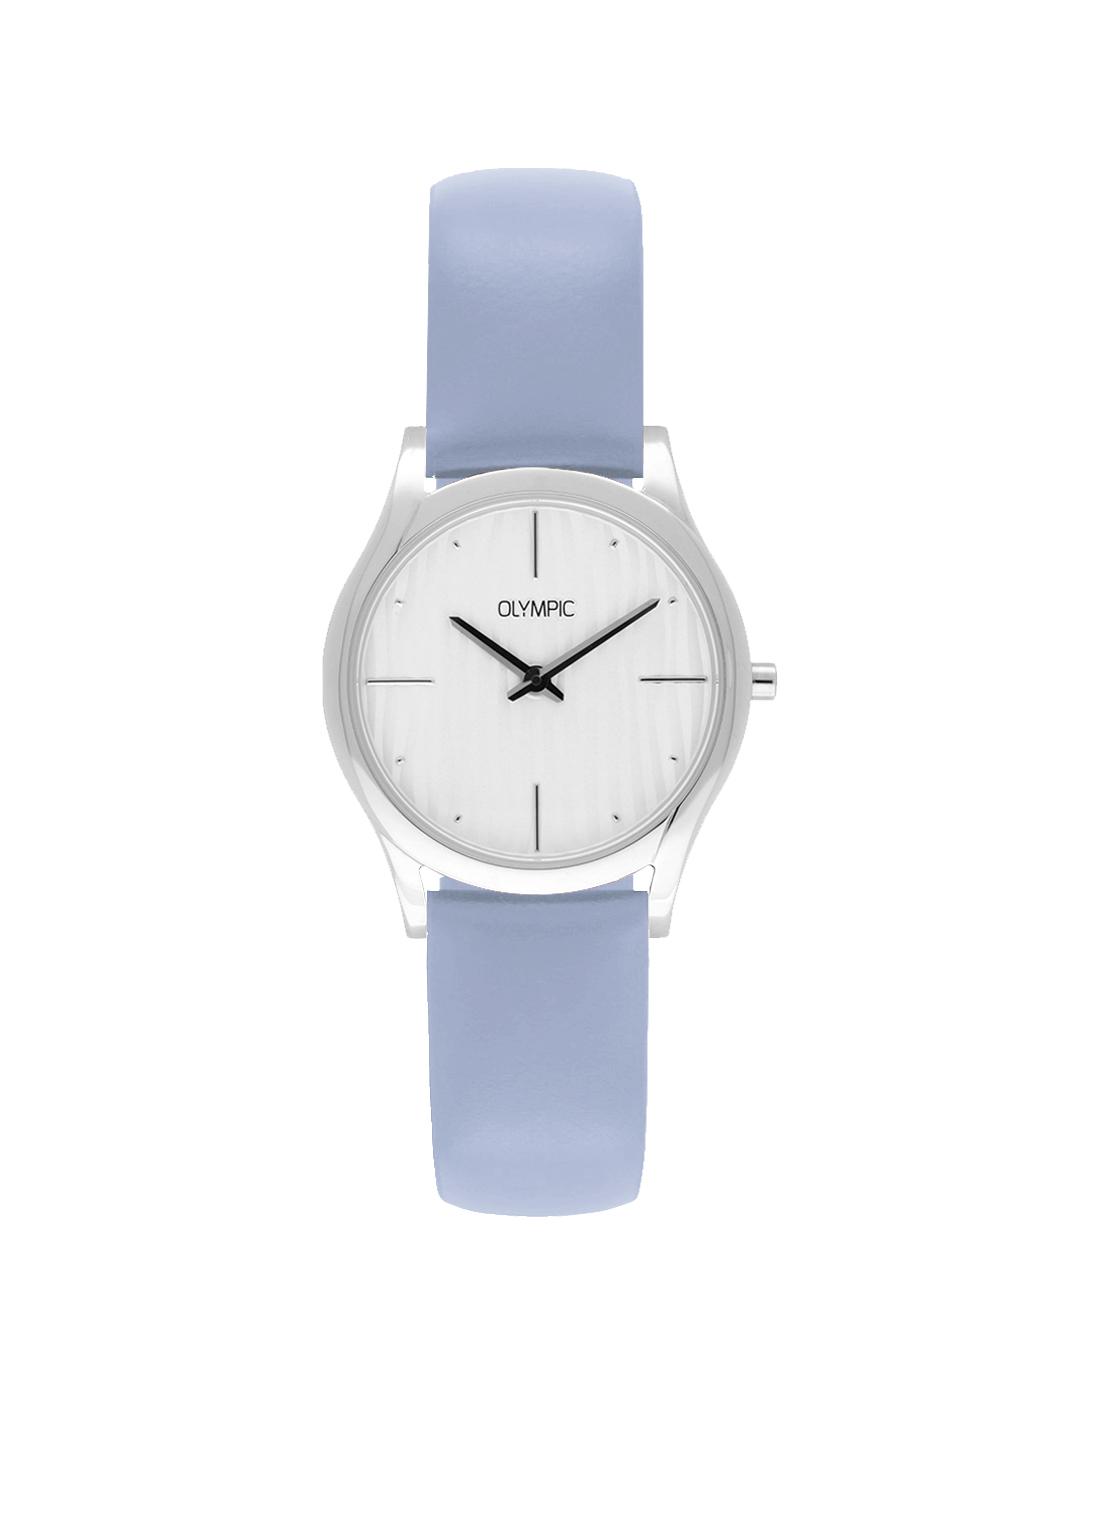 Olympic OL67DSL002 Vicenza Horloge Leer Blauw 32mm Dames